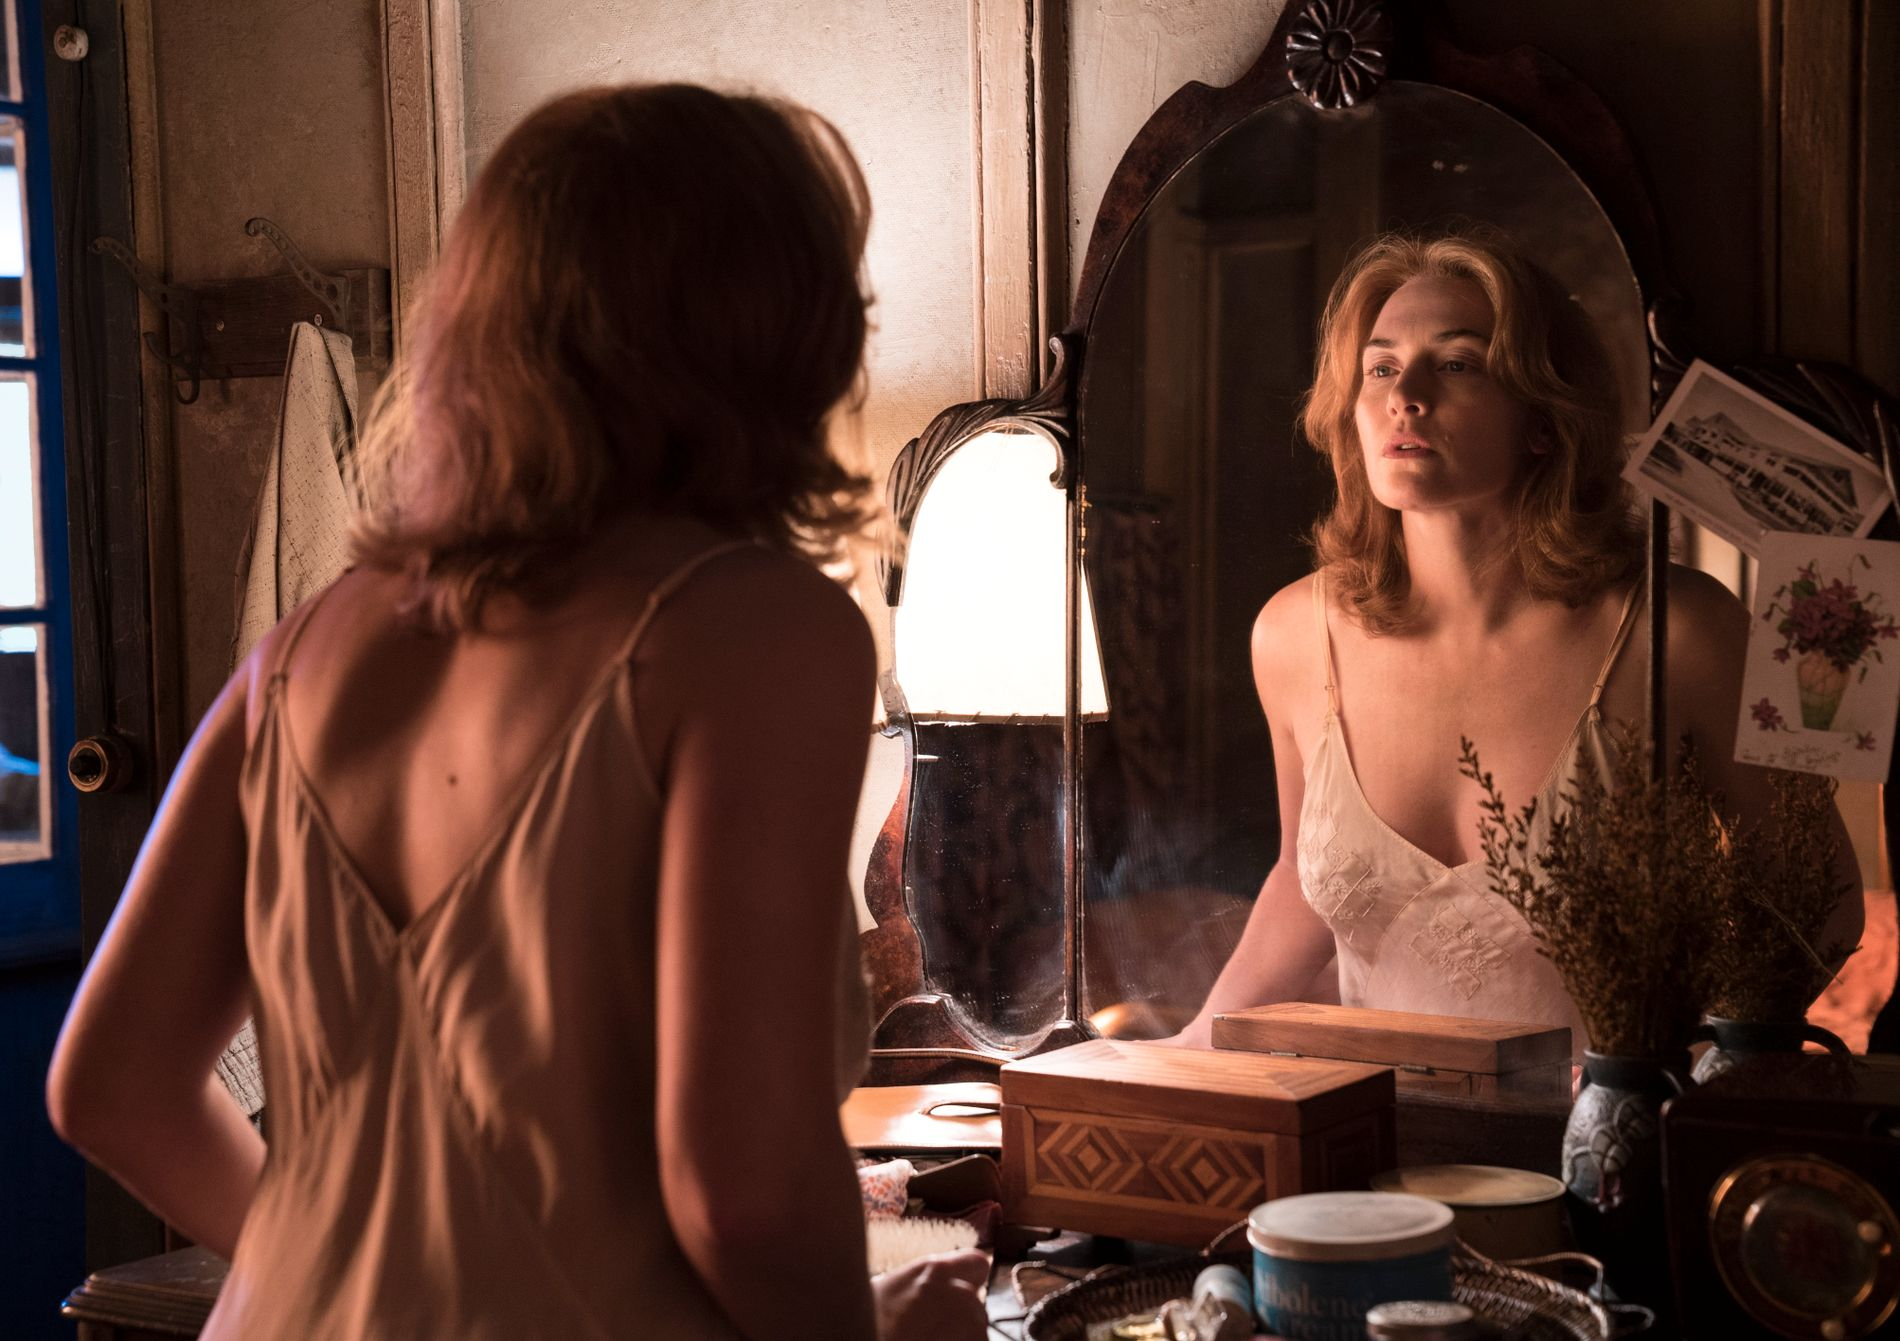 FALLEN KVINNE À LA ALLEN: Kate Winslet spiller hovedrollen i «Wonder Wheel». FOTO: Norsk Filmdistribusjon.